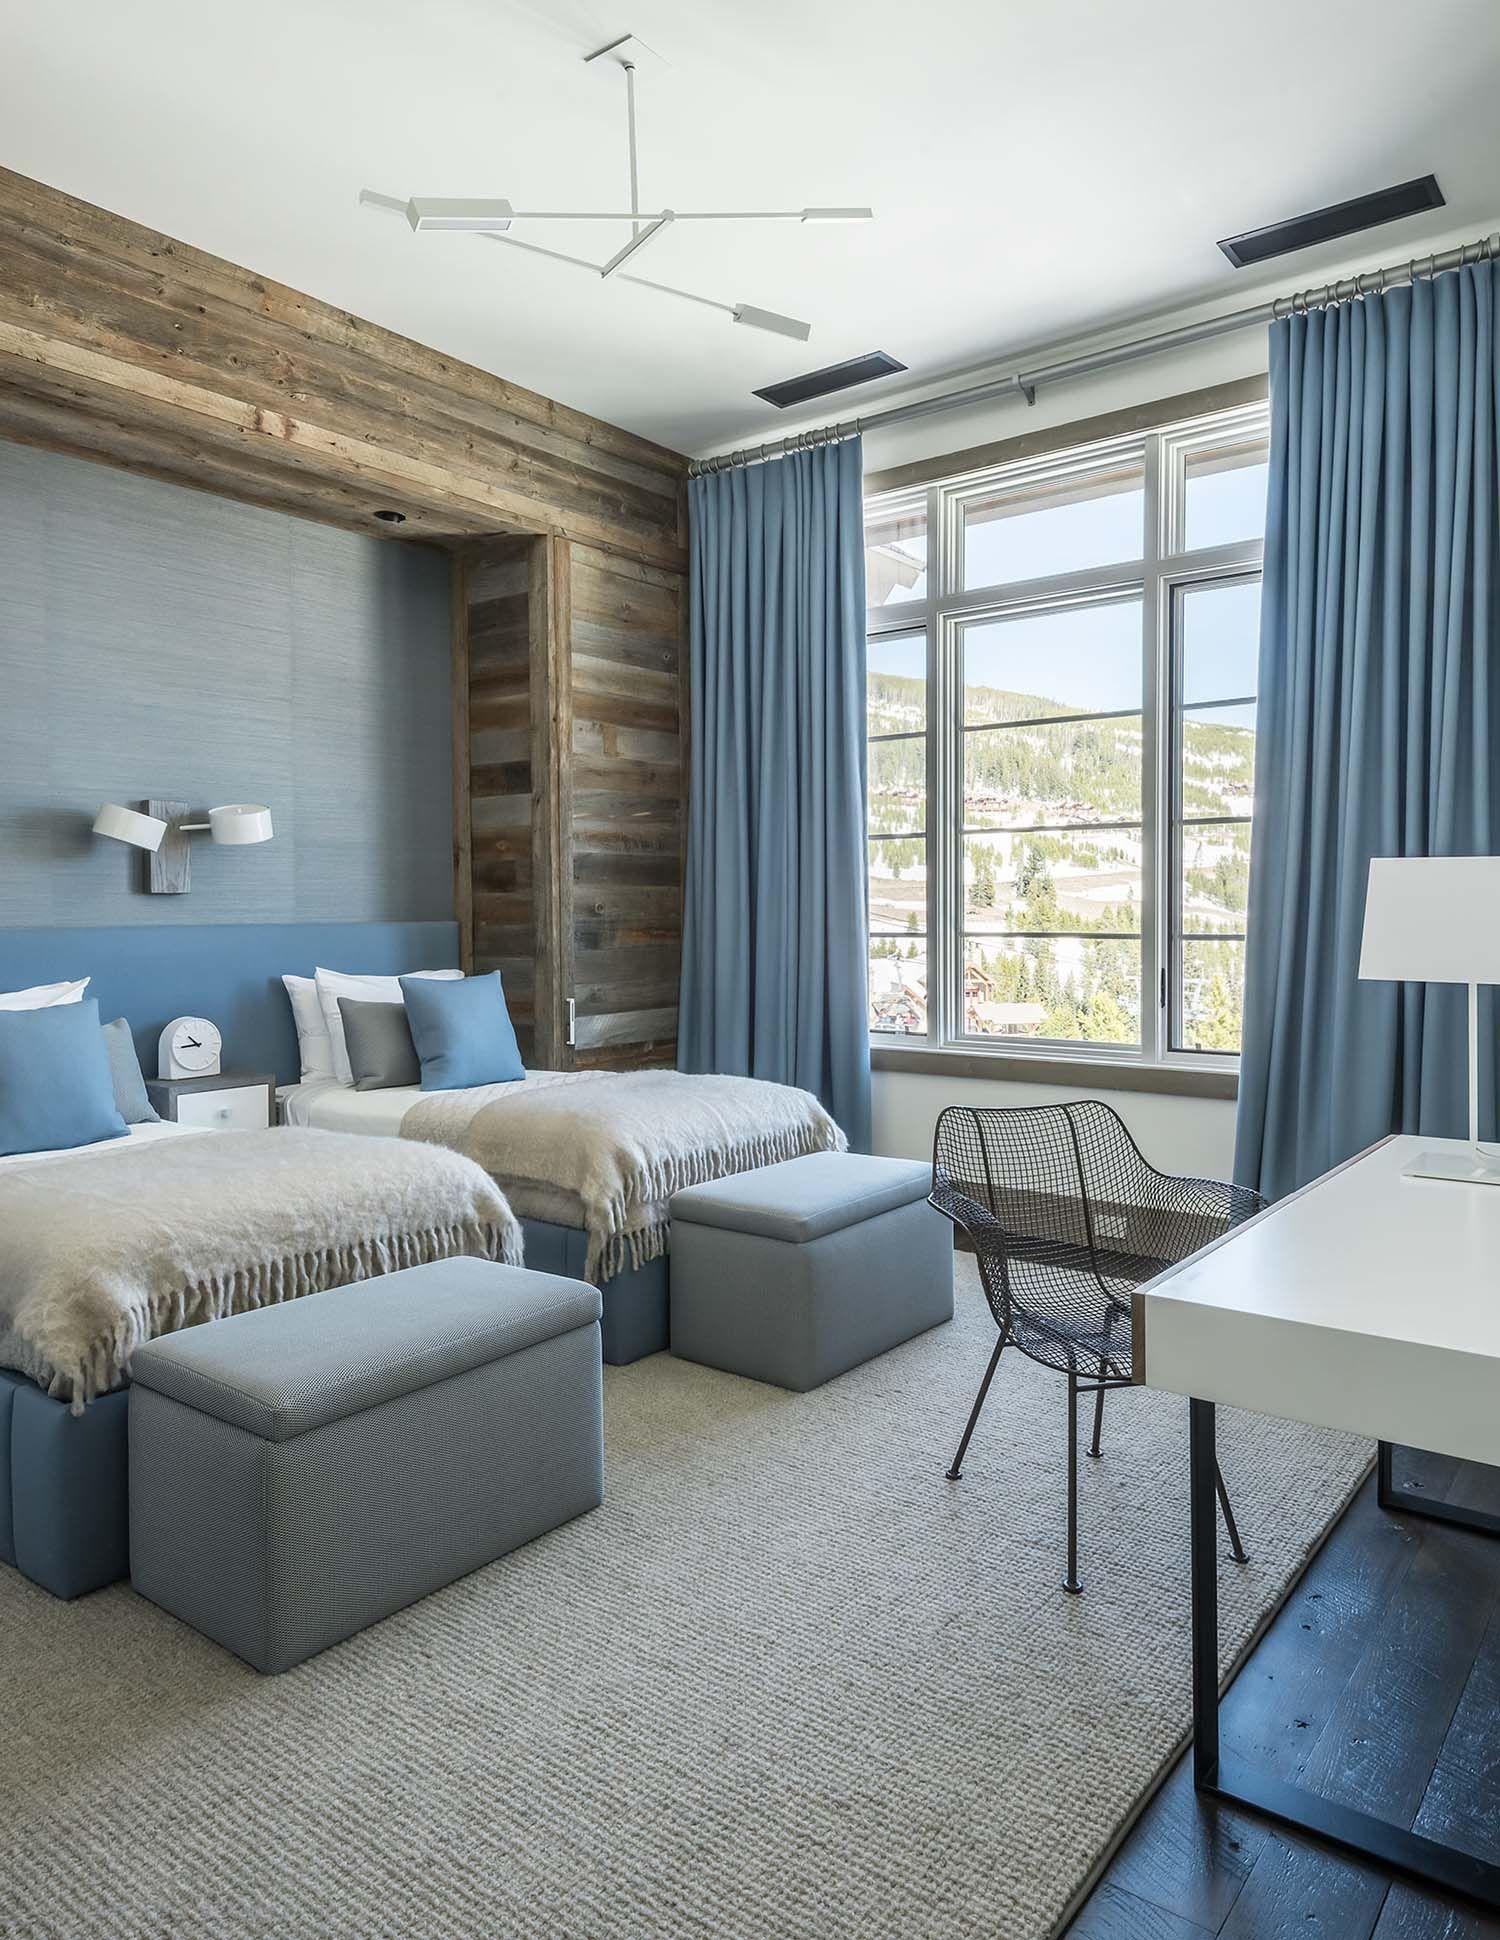 Modern rustic kids bedroom - Hillside Snowcrest The Ultimate Modern Rustic Ski Chalet In Montana